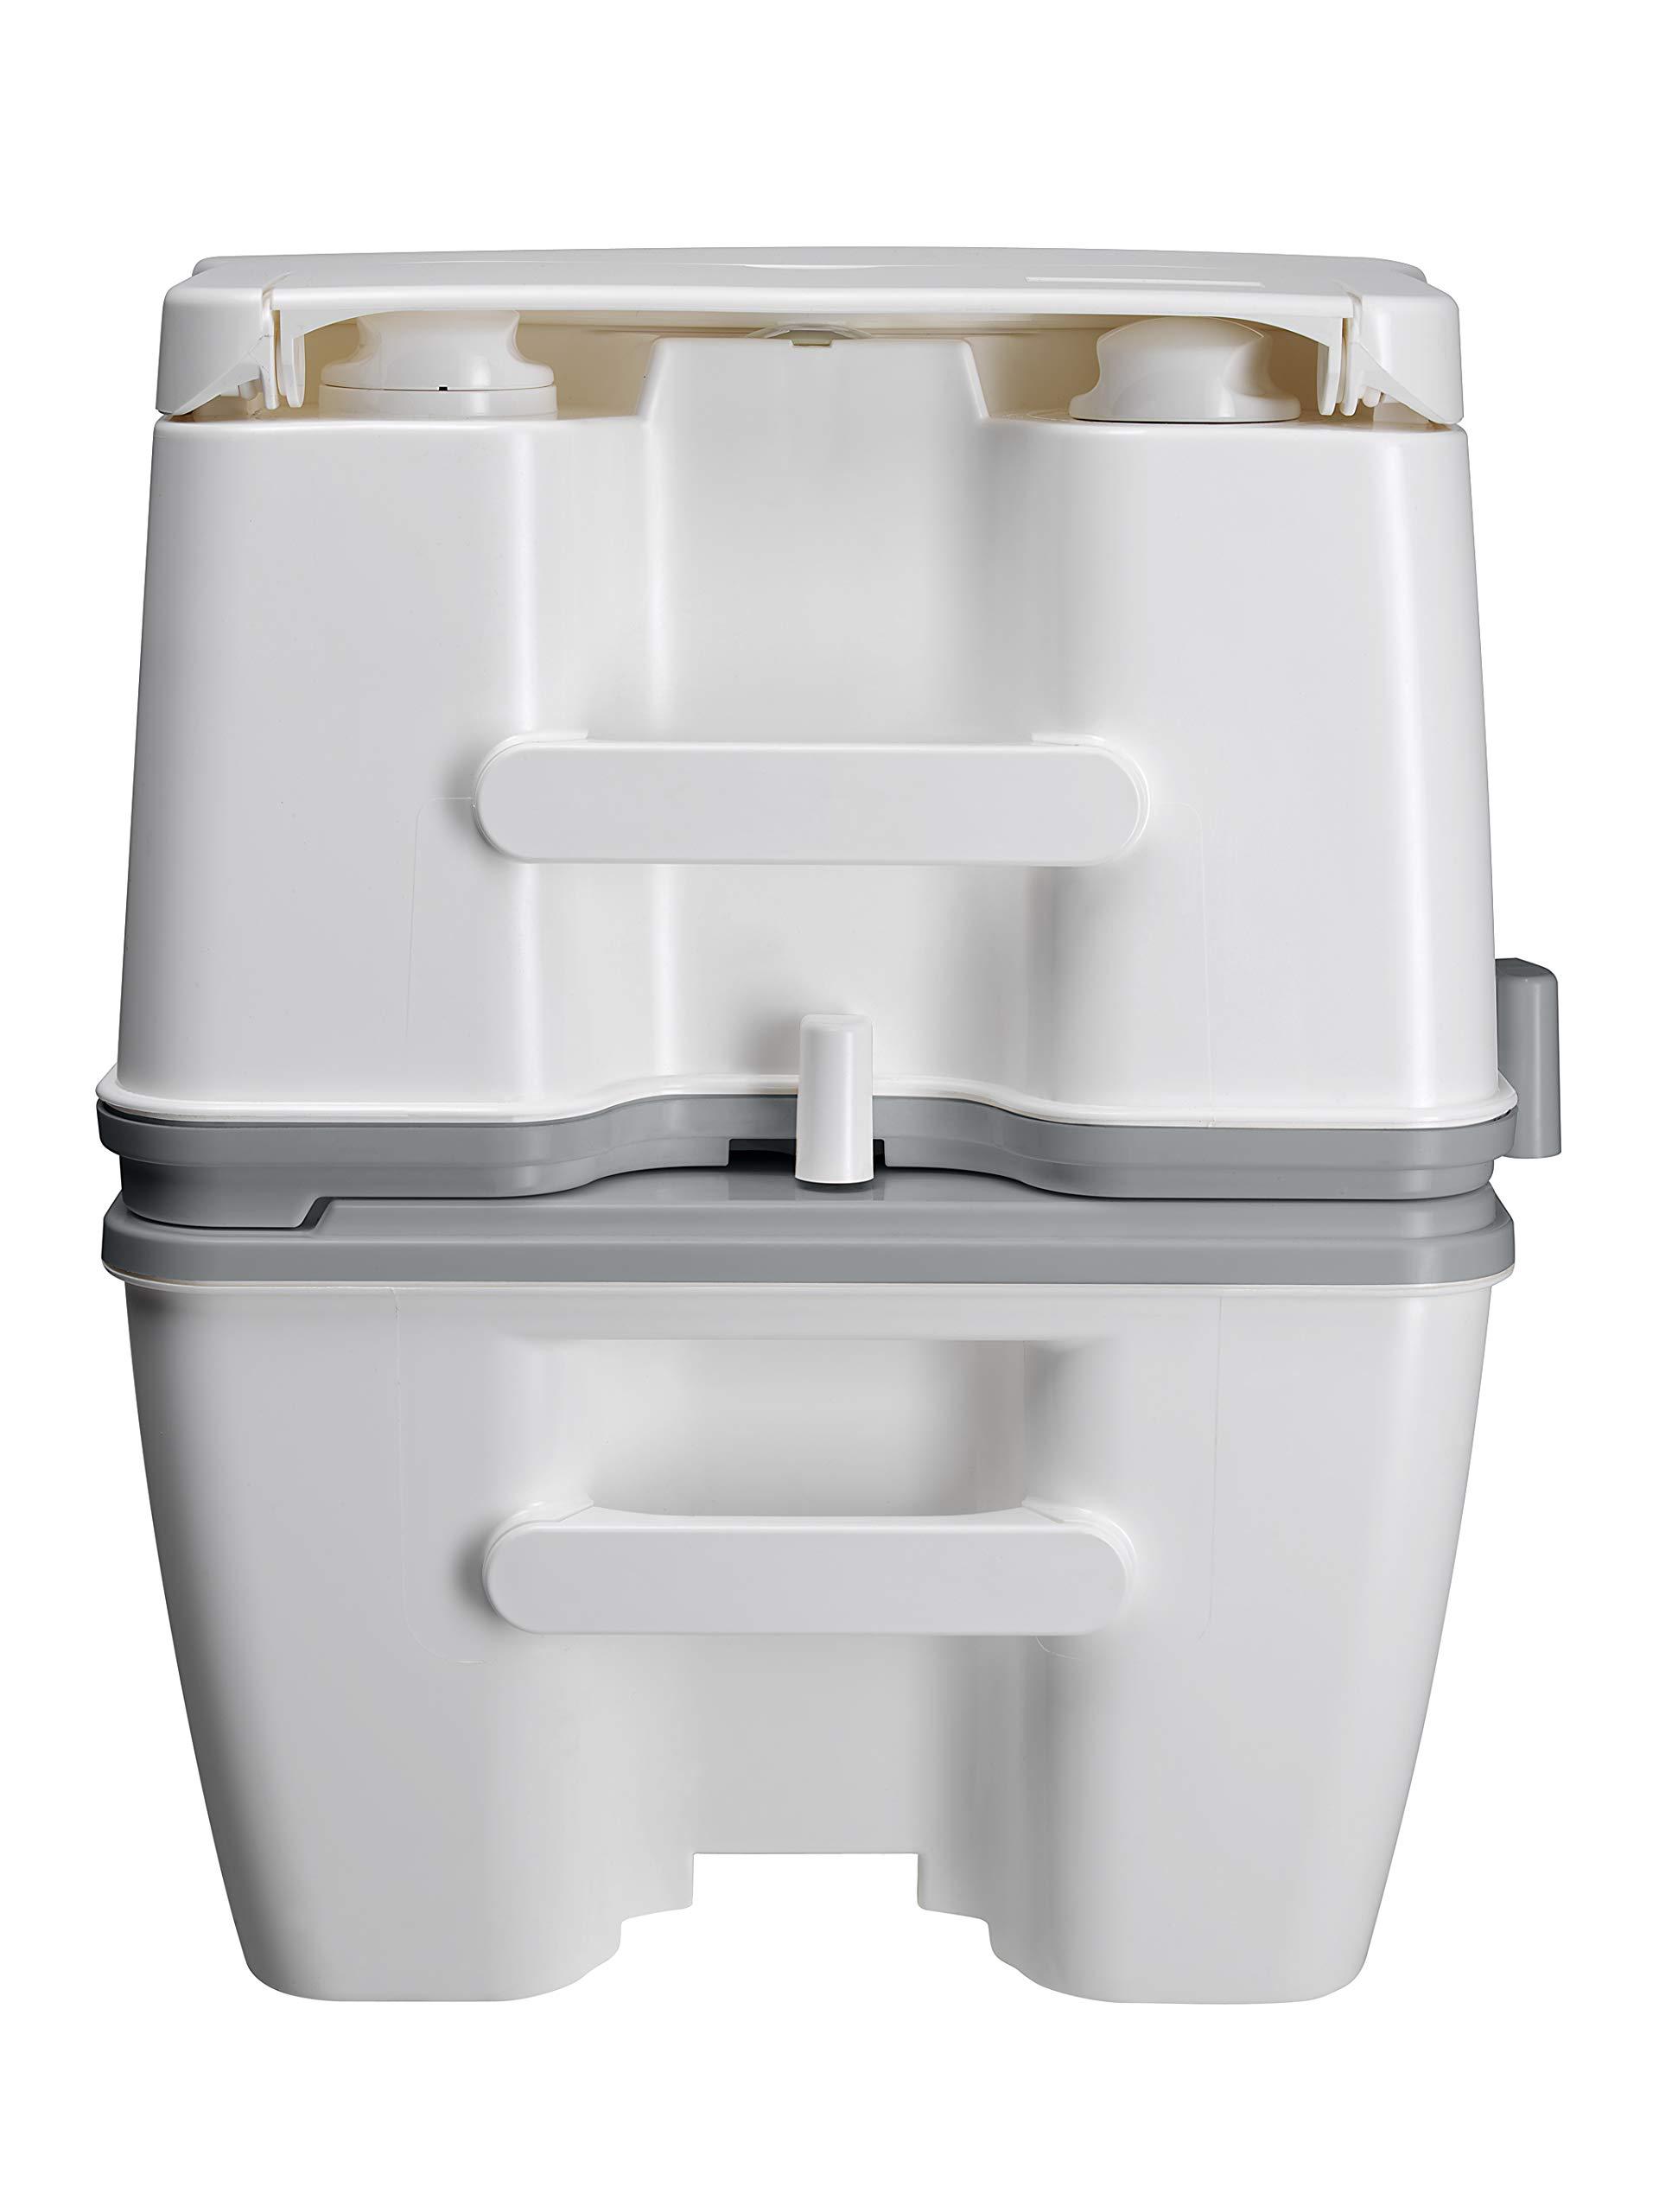 Thetford 92305 Porta Potti 565P Excellence Portable Toilet (Manual), 448 x 388 x 450 mm 12